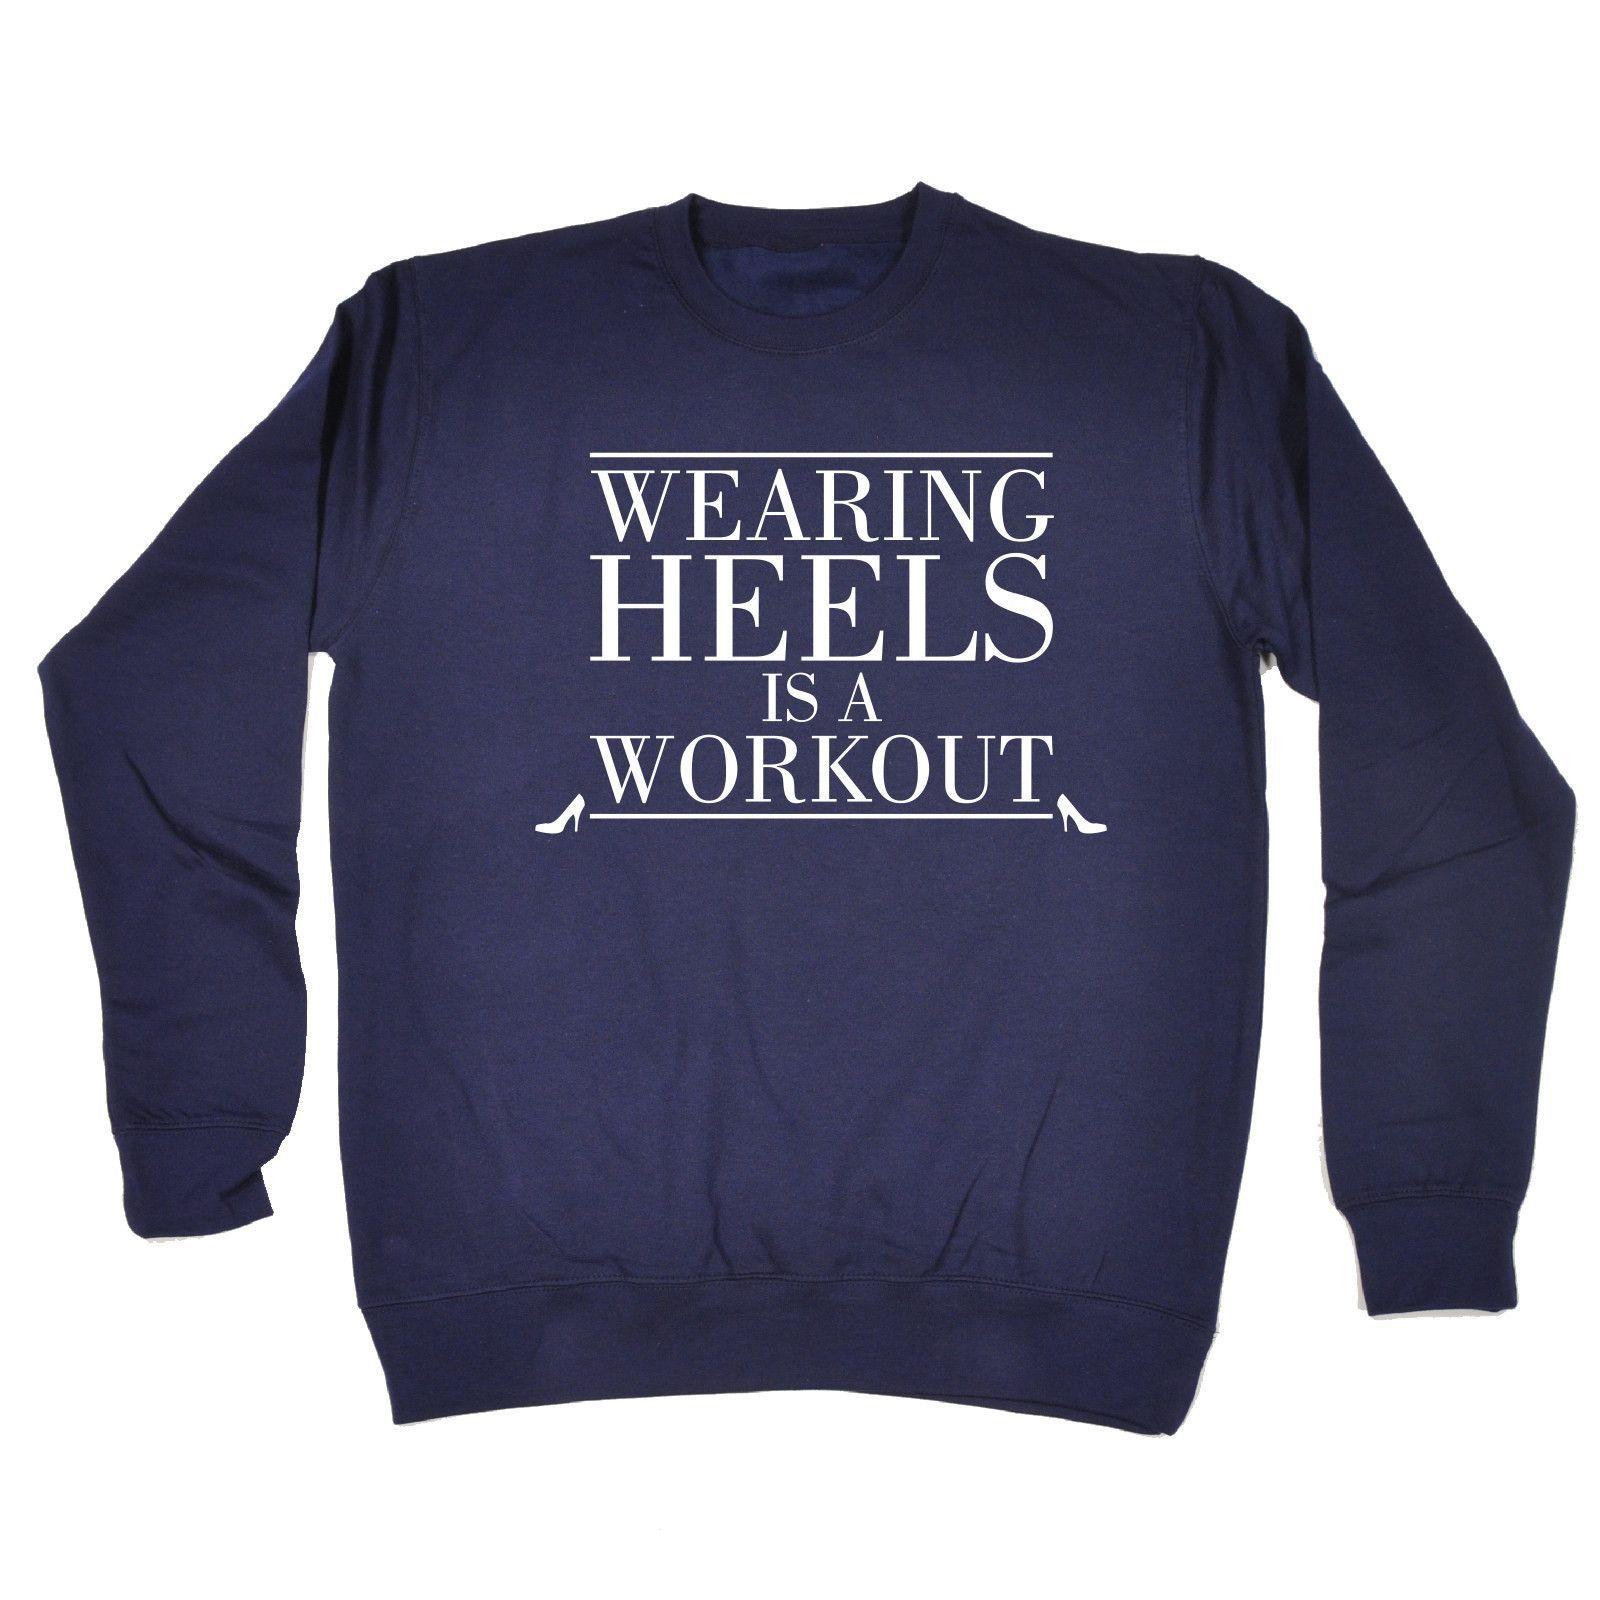 123t USA Wearing Heels Is A Workout Funny Sweatshirt